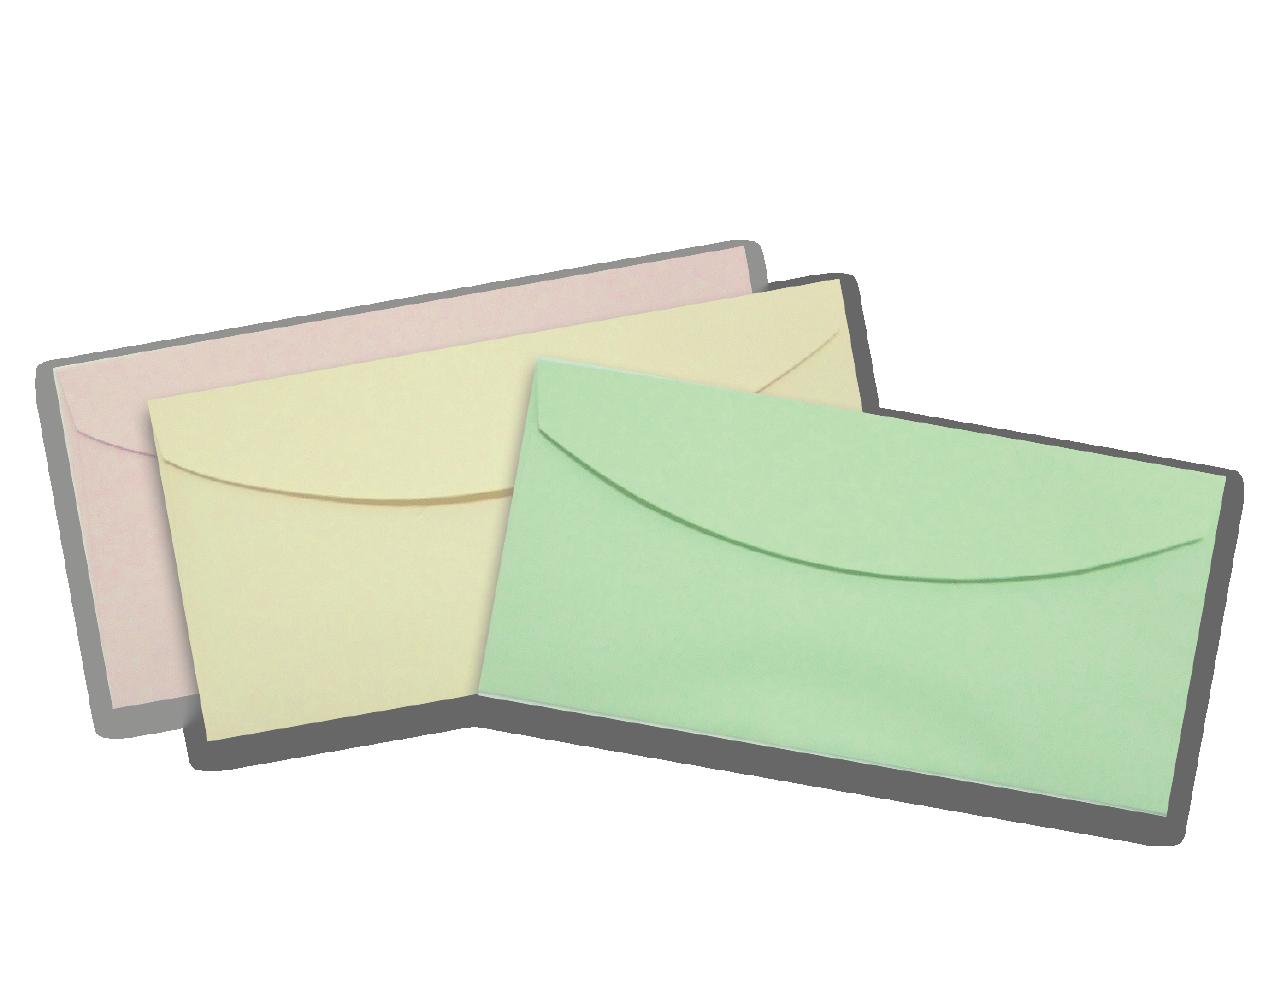 Envelope 11 x 22 cm. 100 g ฿ 2.50